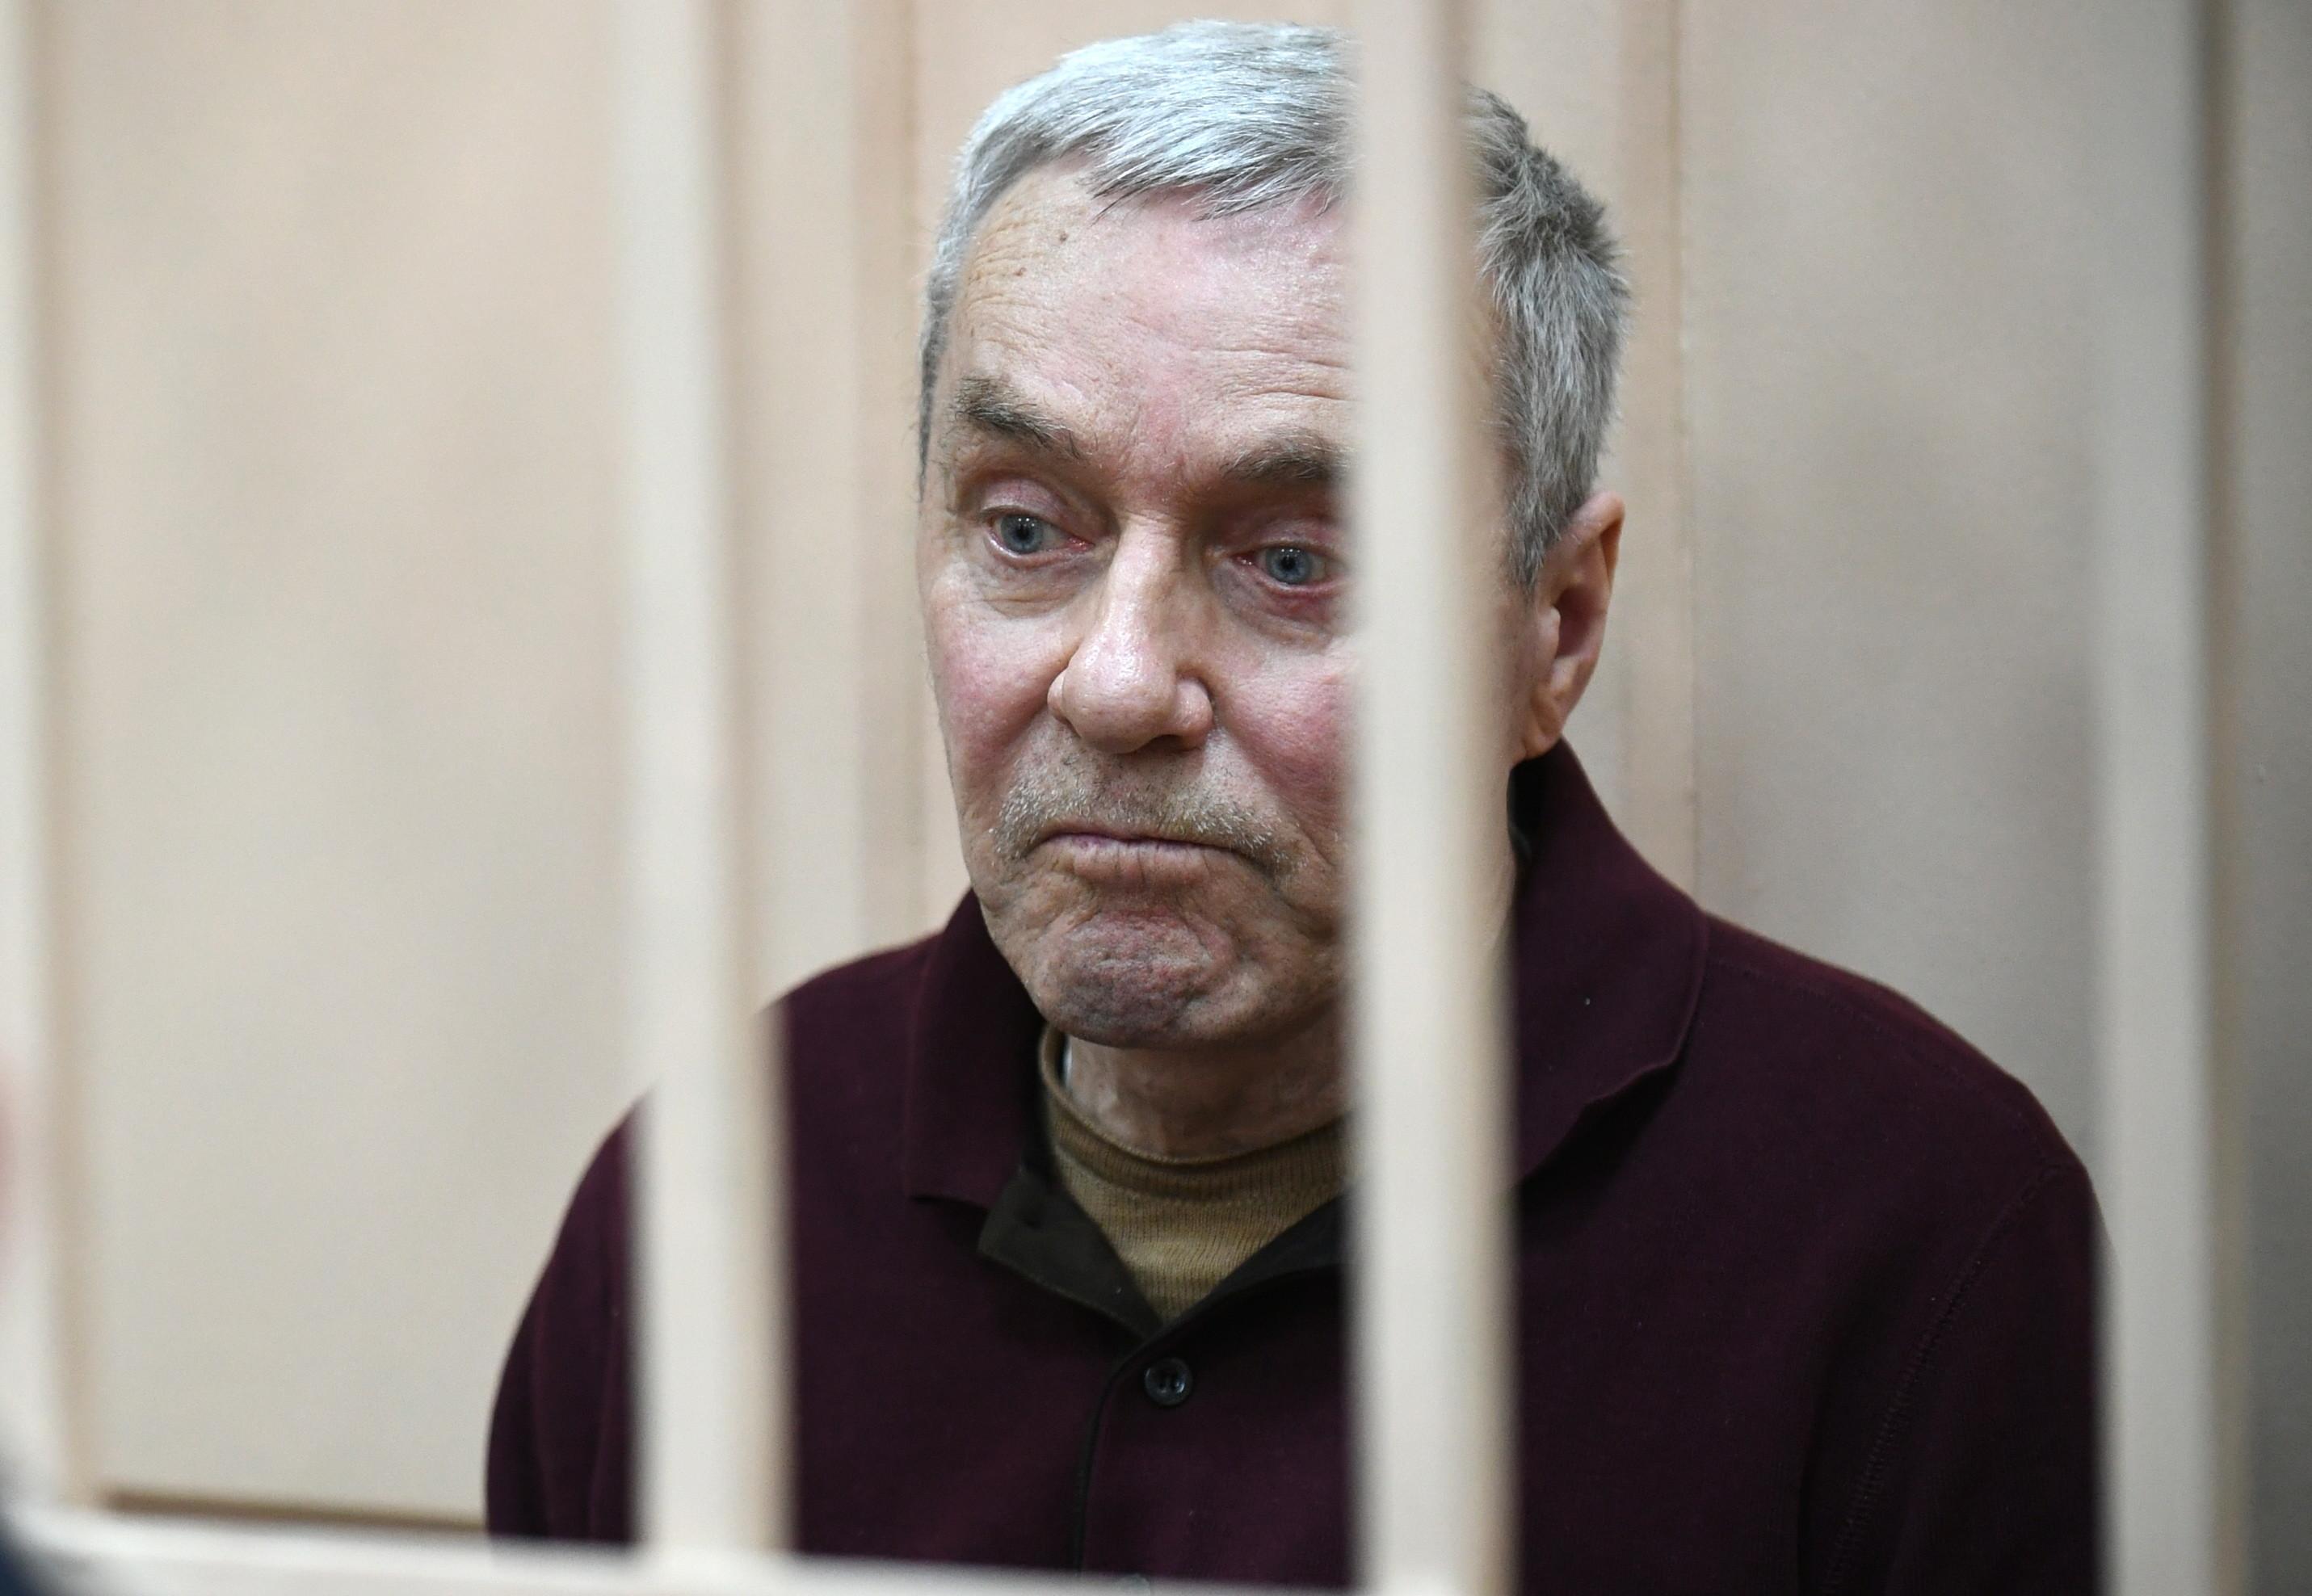 Отец полковника Захарченко возместил вред банку «МИА» в4 млн